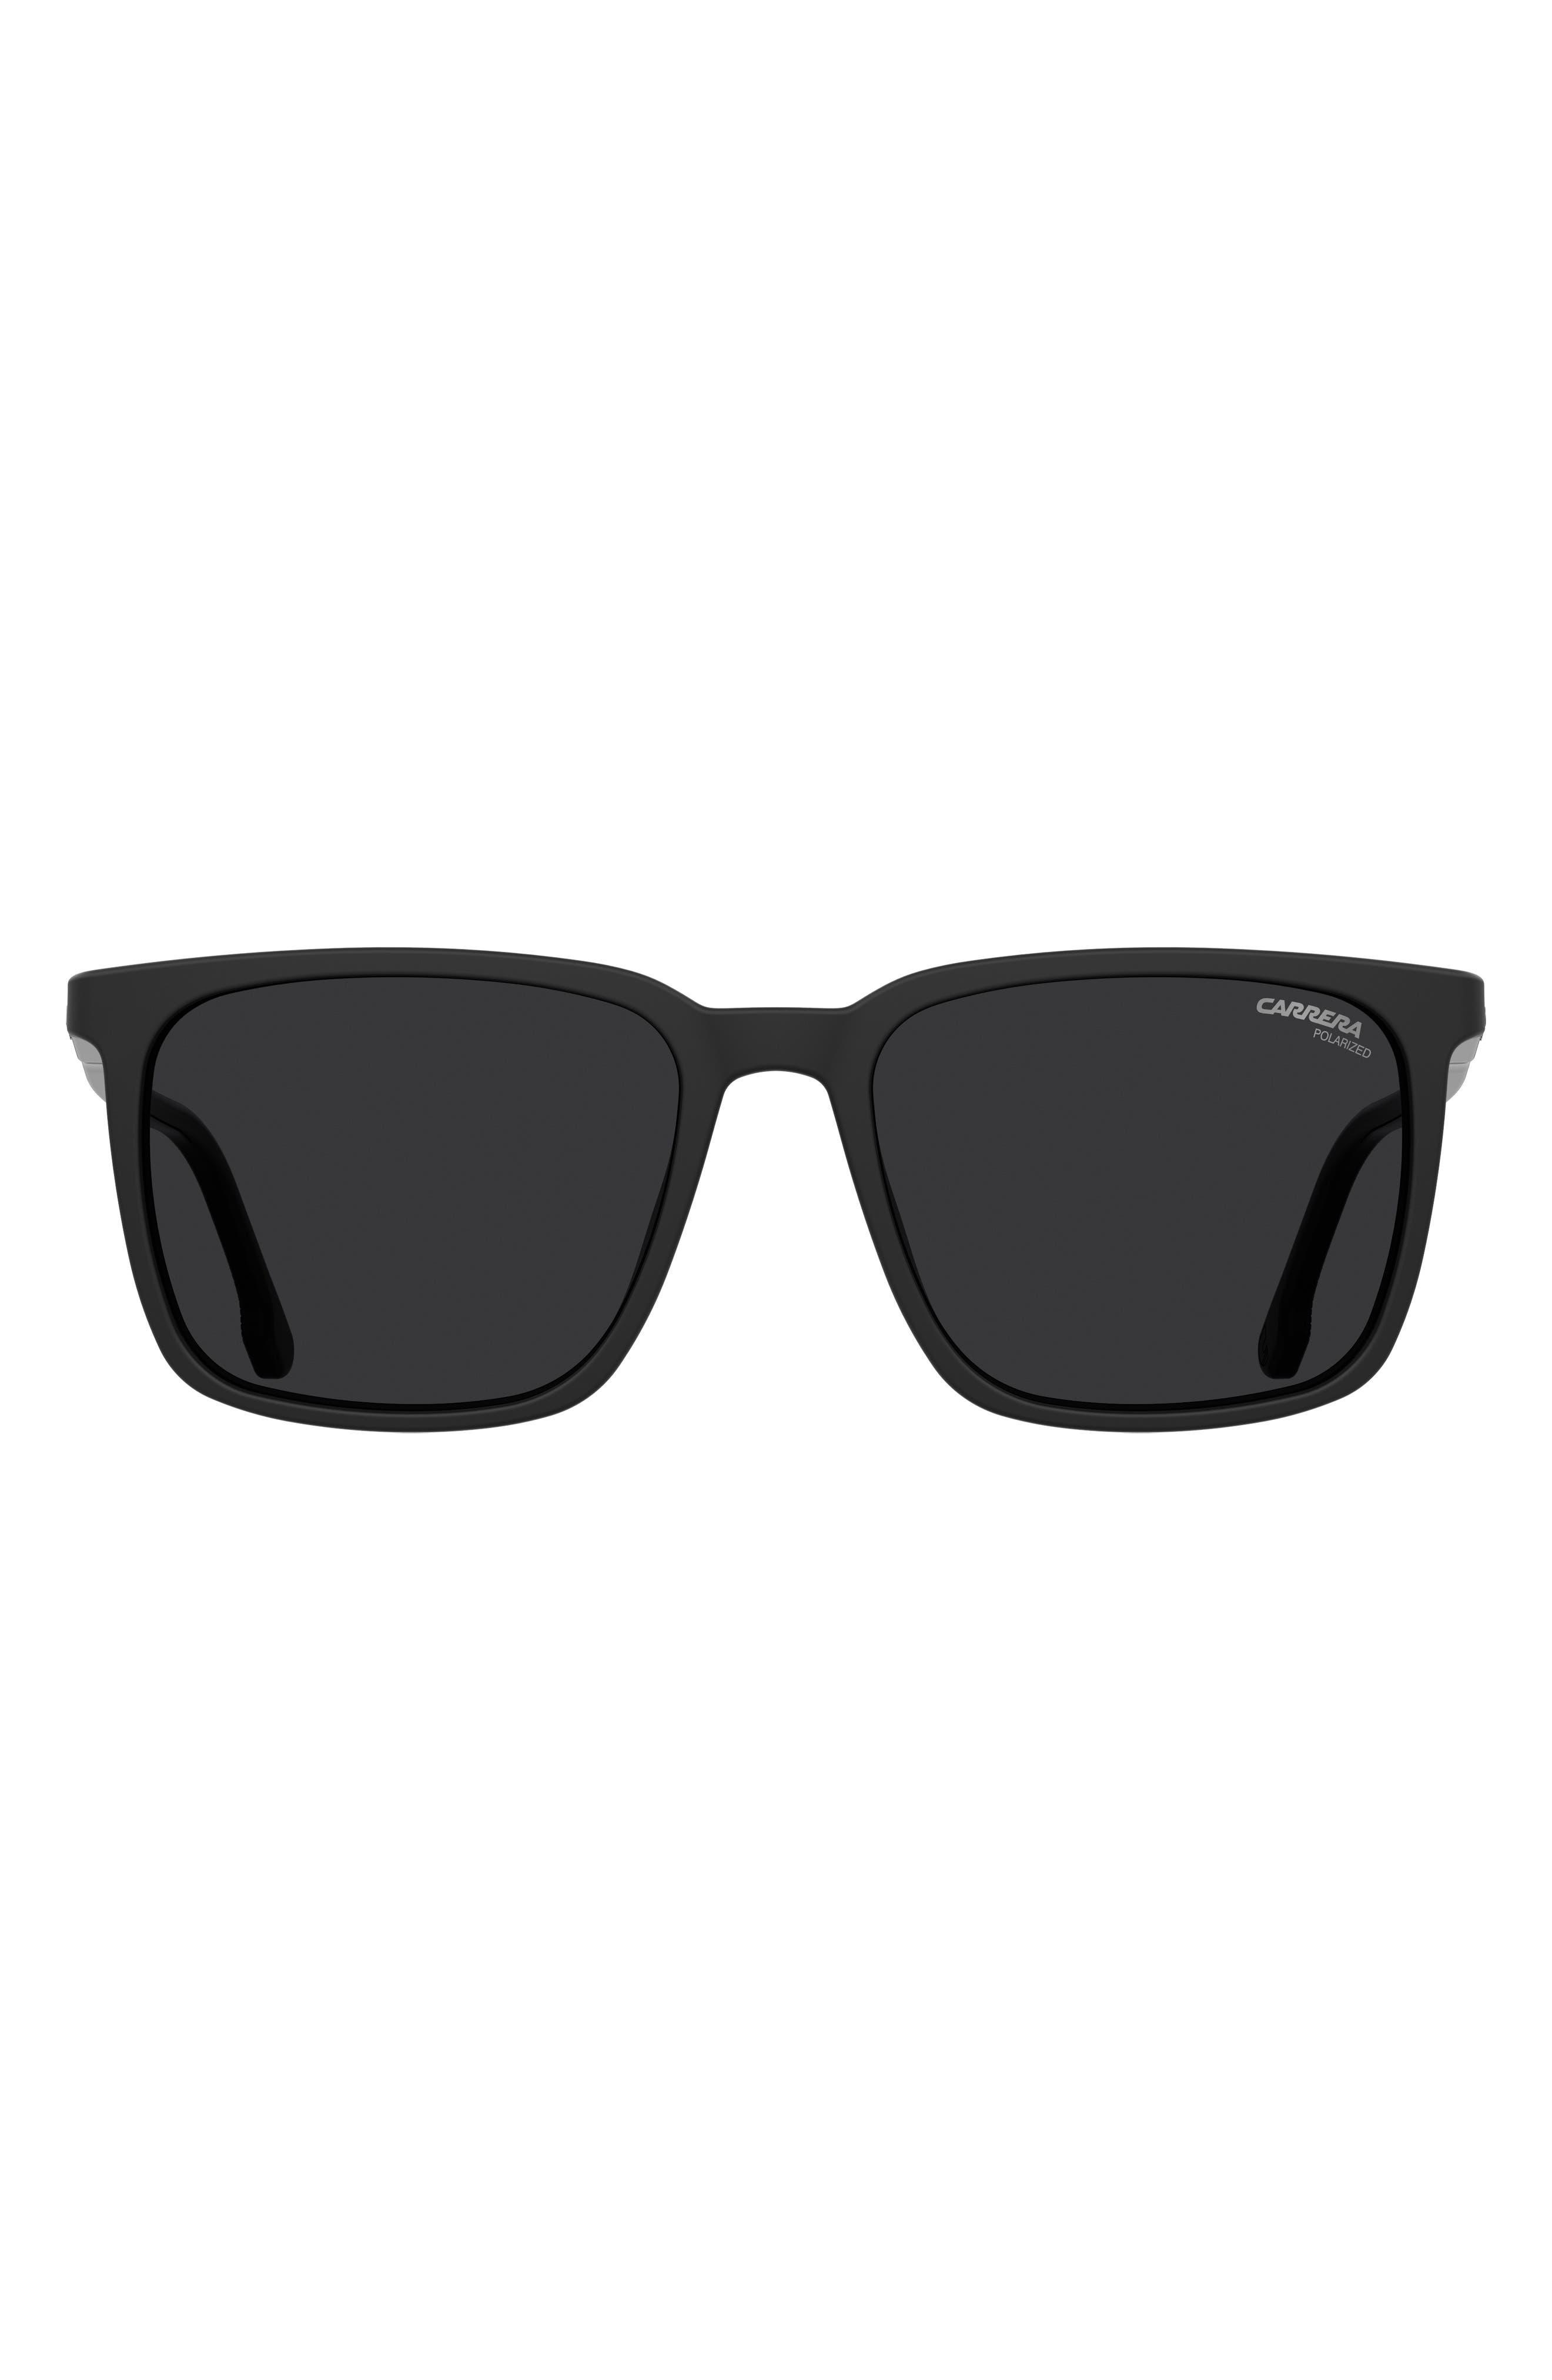 55mm Polarized Rectangle Sunglasses